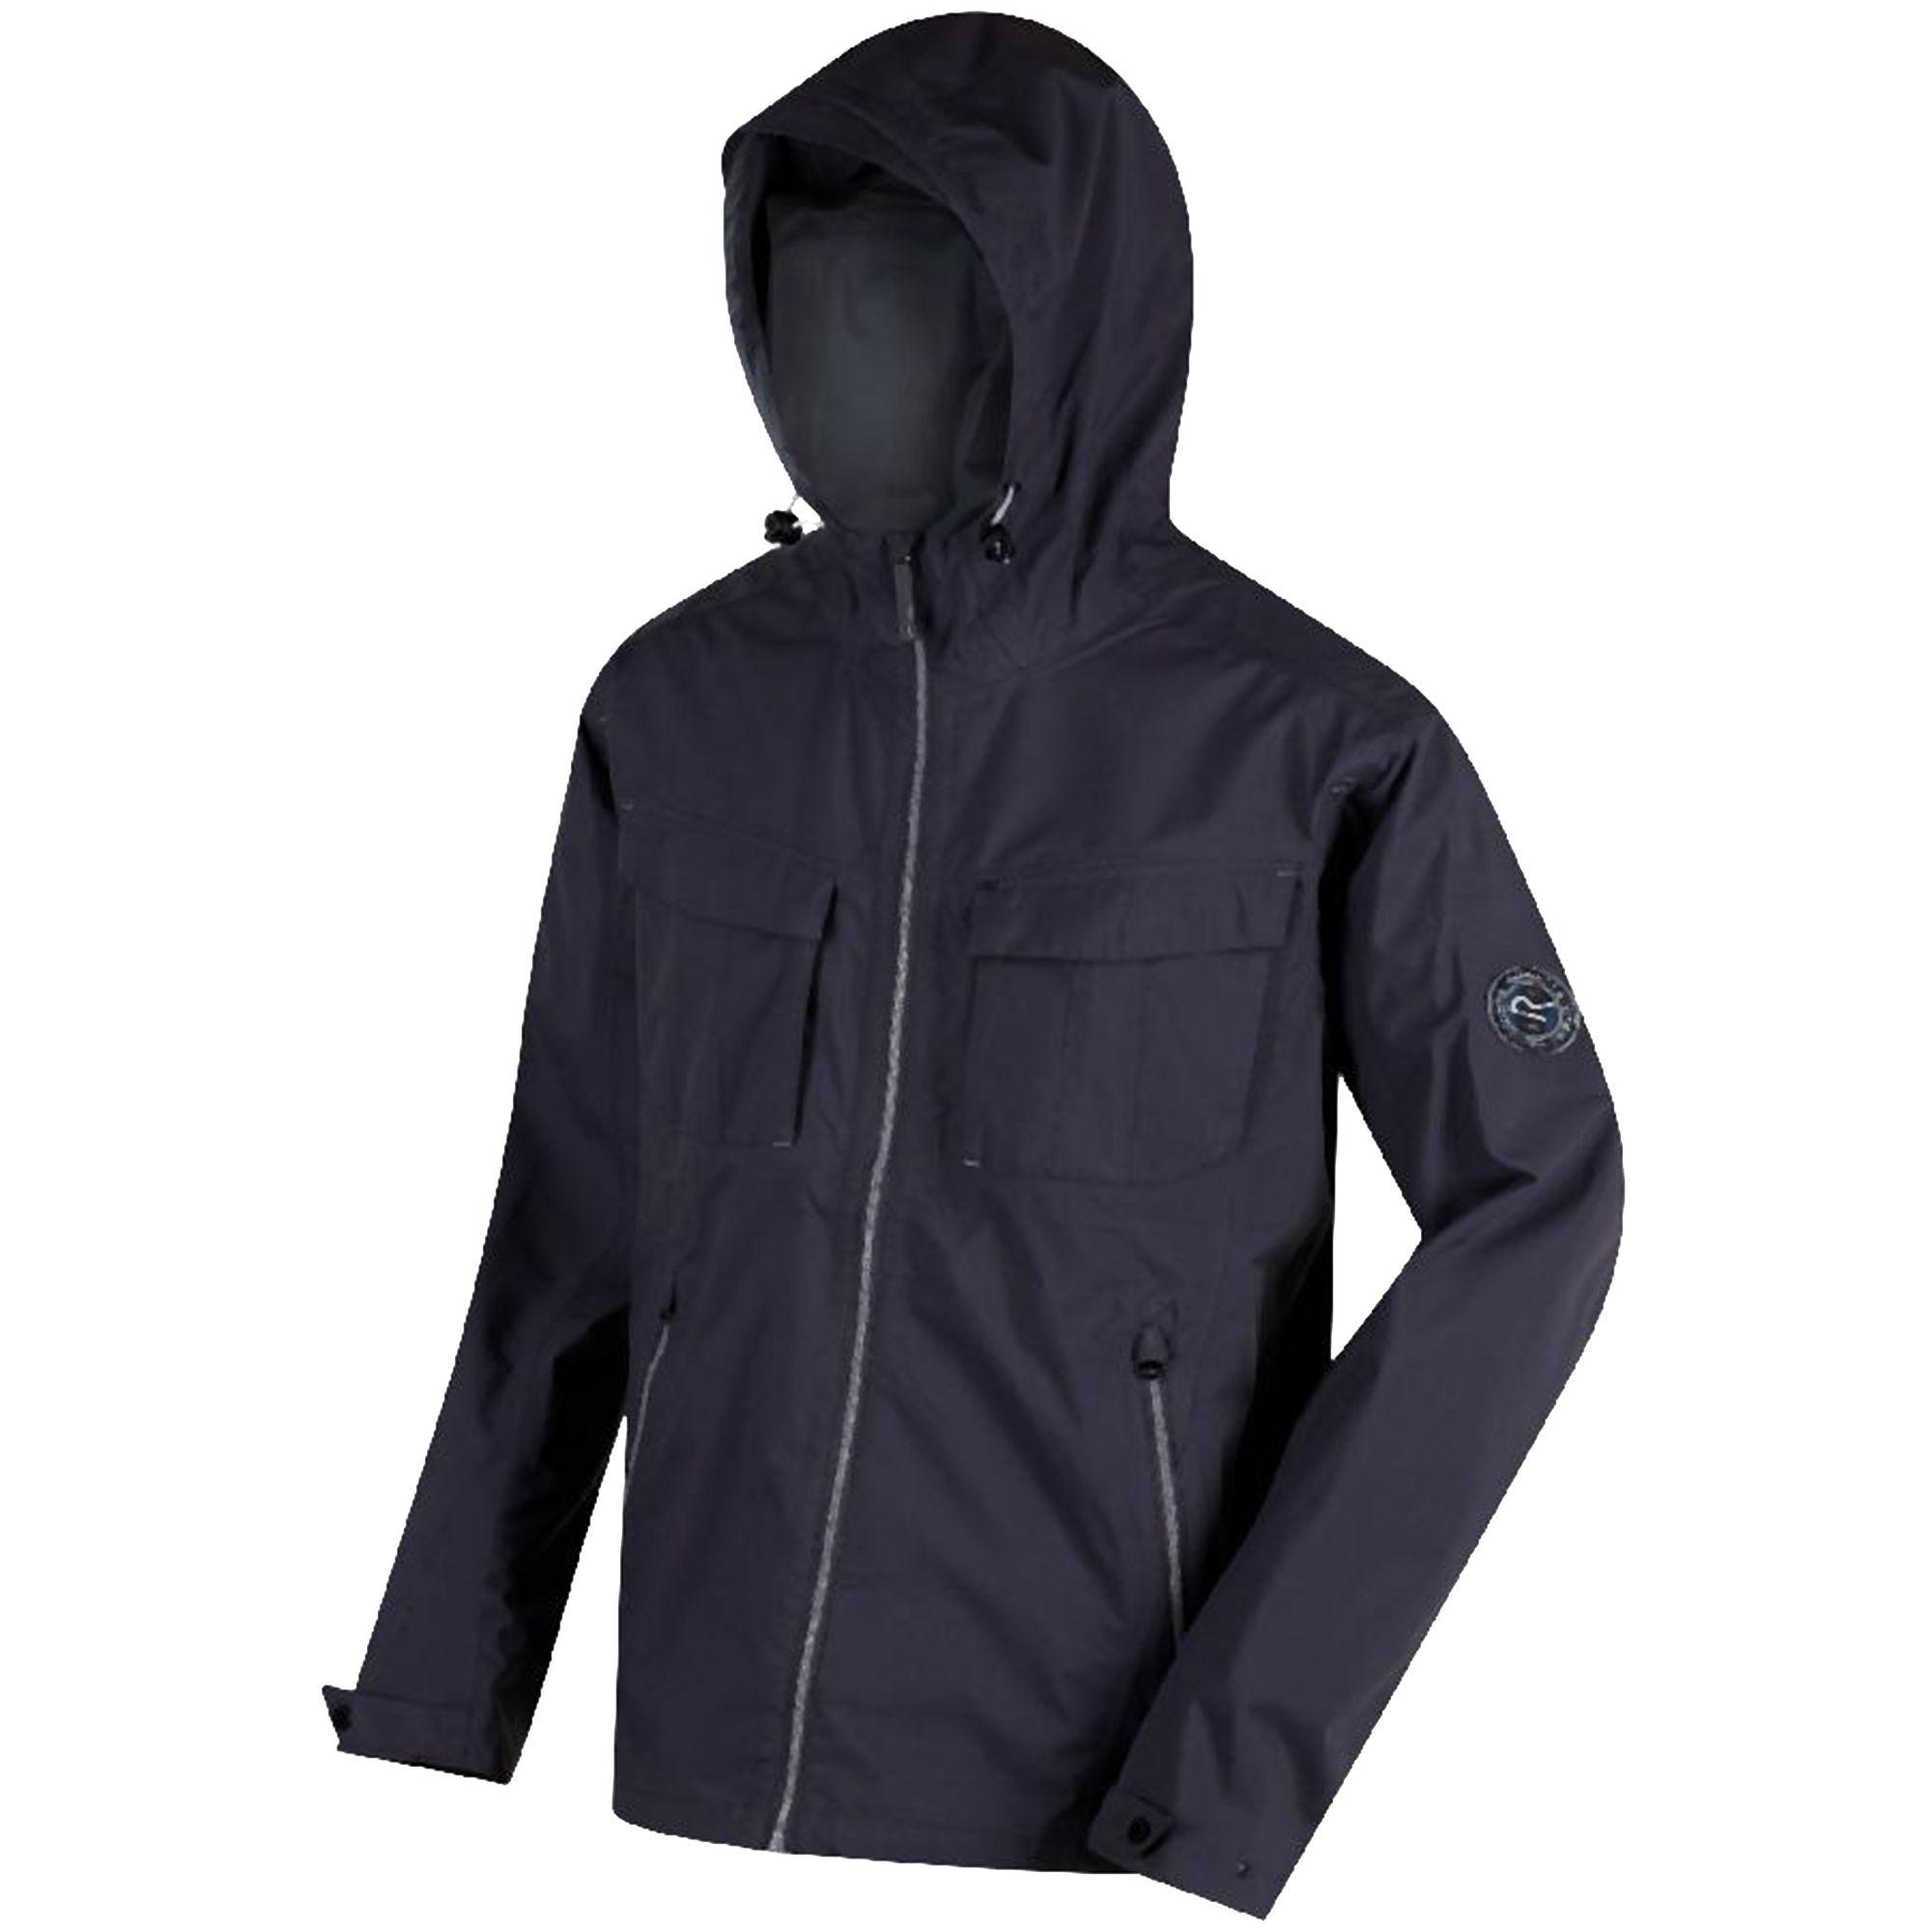 Regatta Great Outdoors Mens Bardolf Stretch Waterproof Jacket